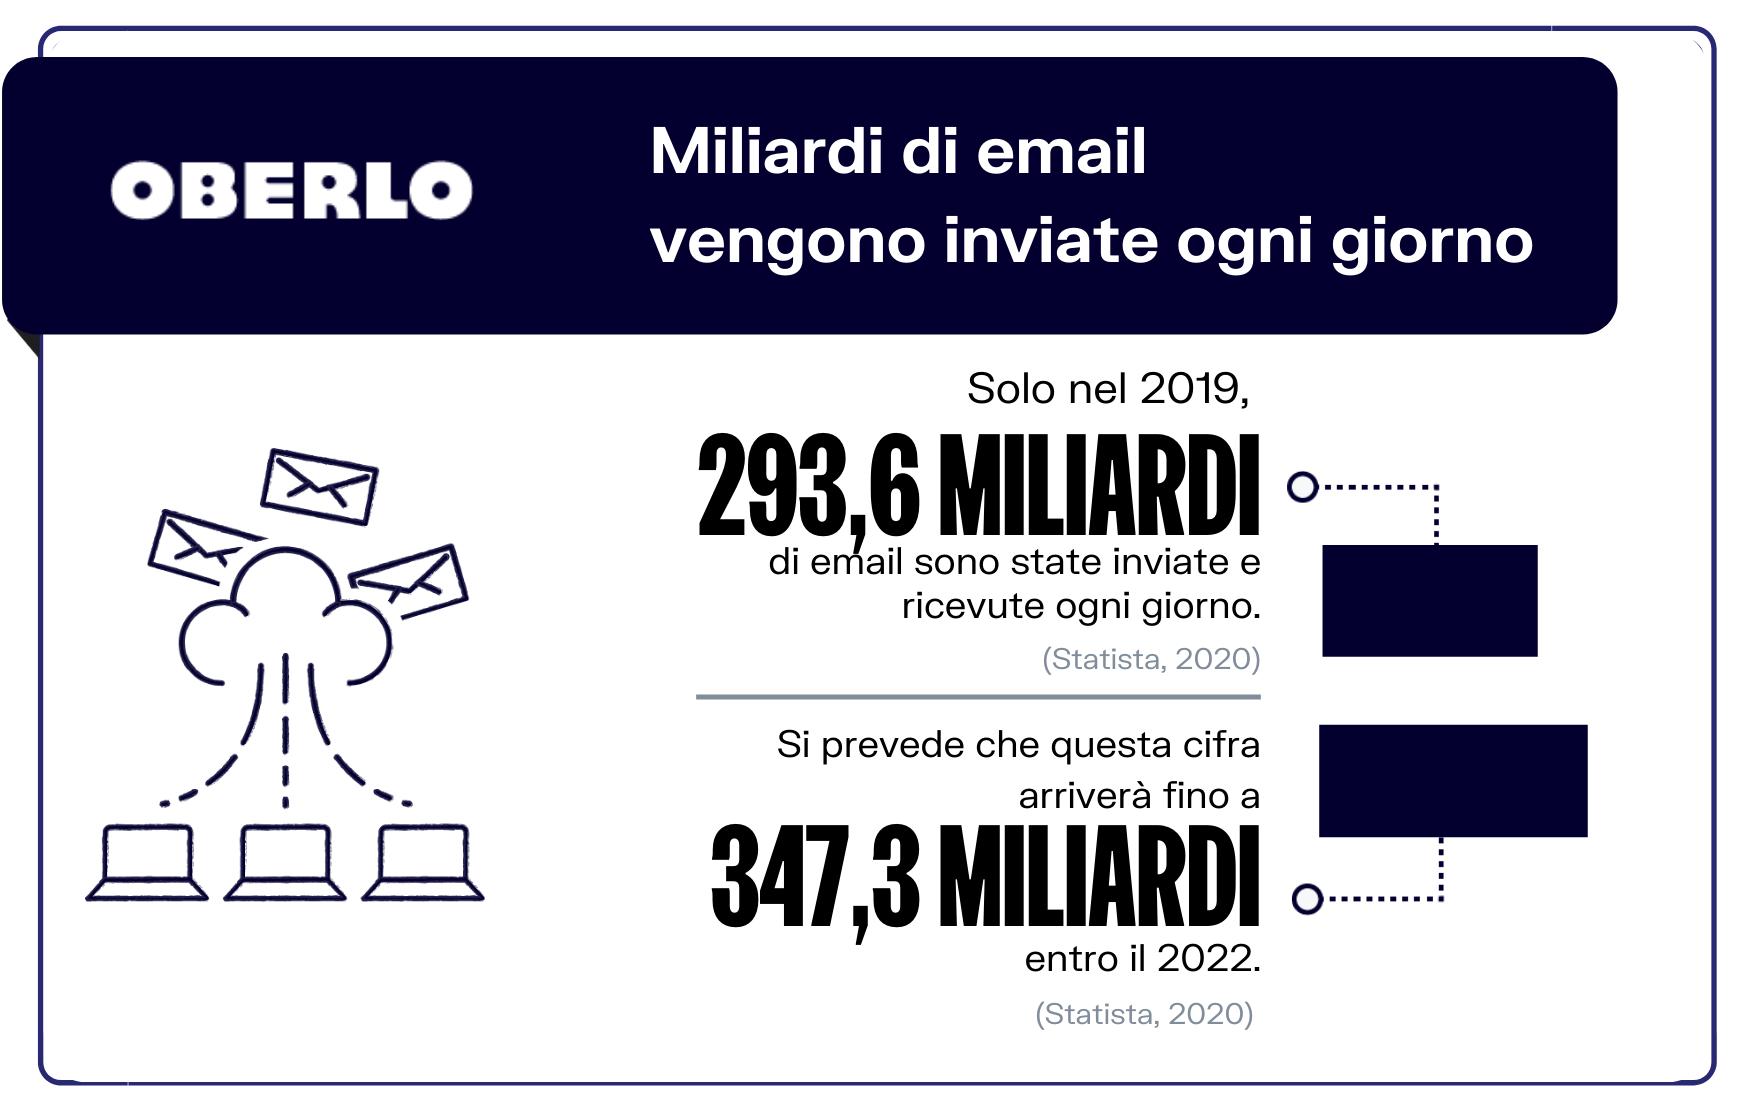 statistiche email marketing giornaliere